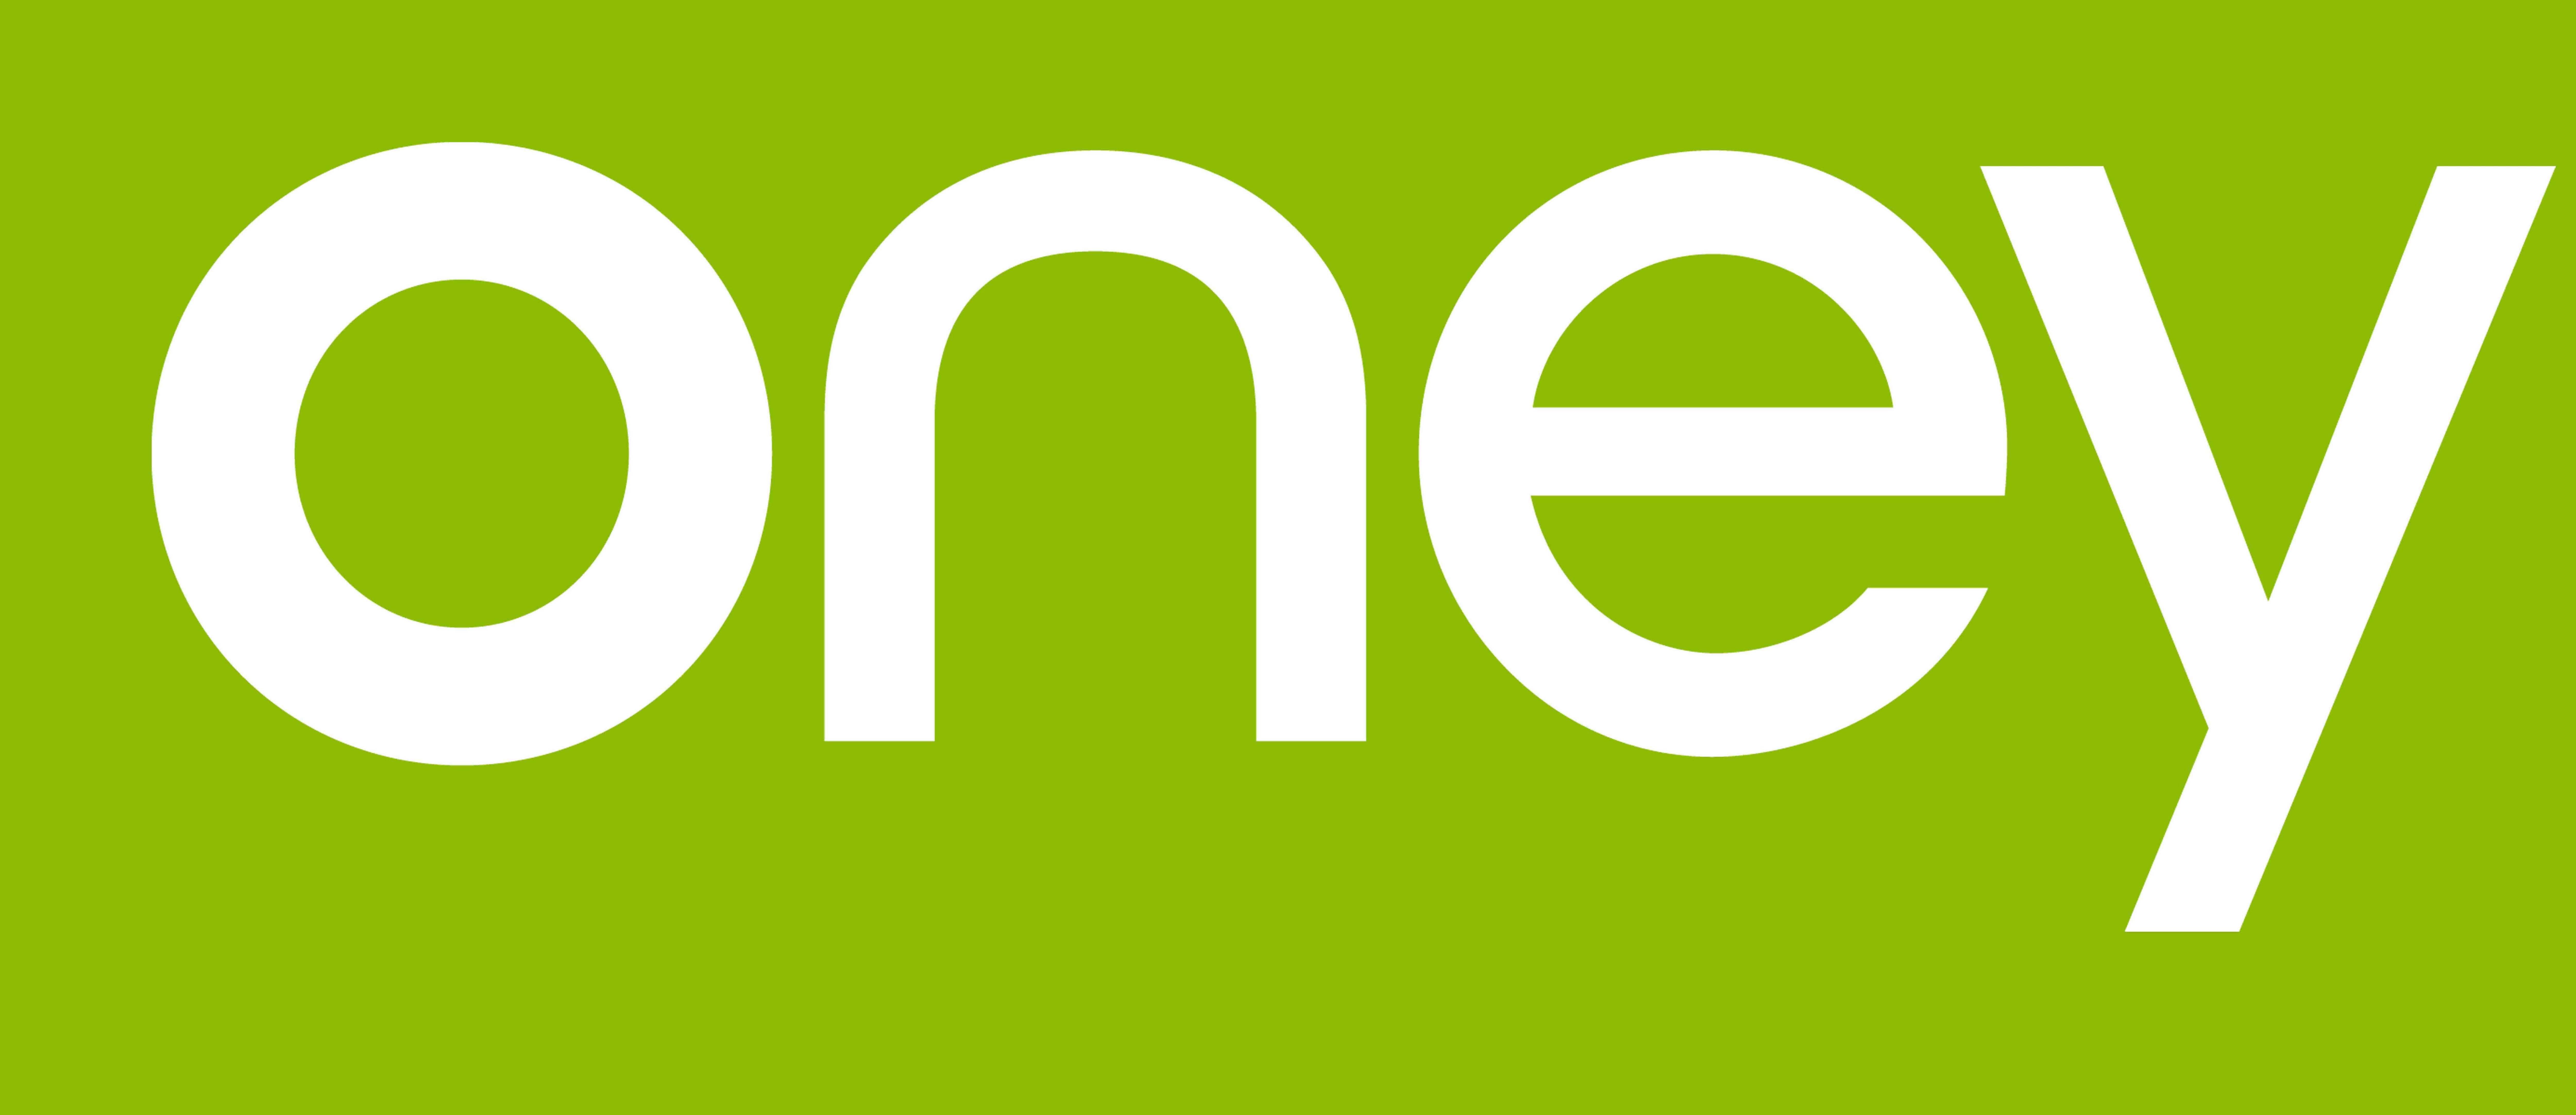 banque accord change de nom et devient oney. Black Bedroom Furniture Sets. Home Design Ideas